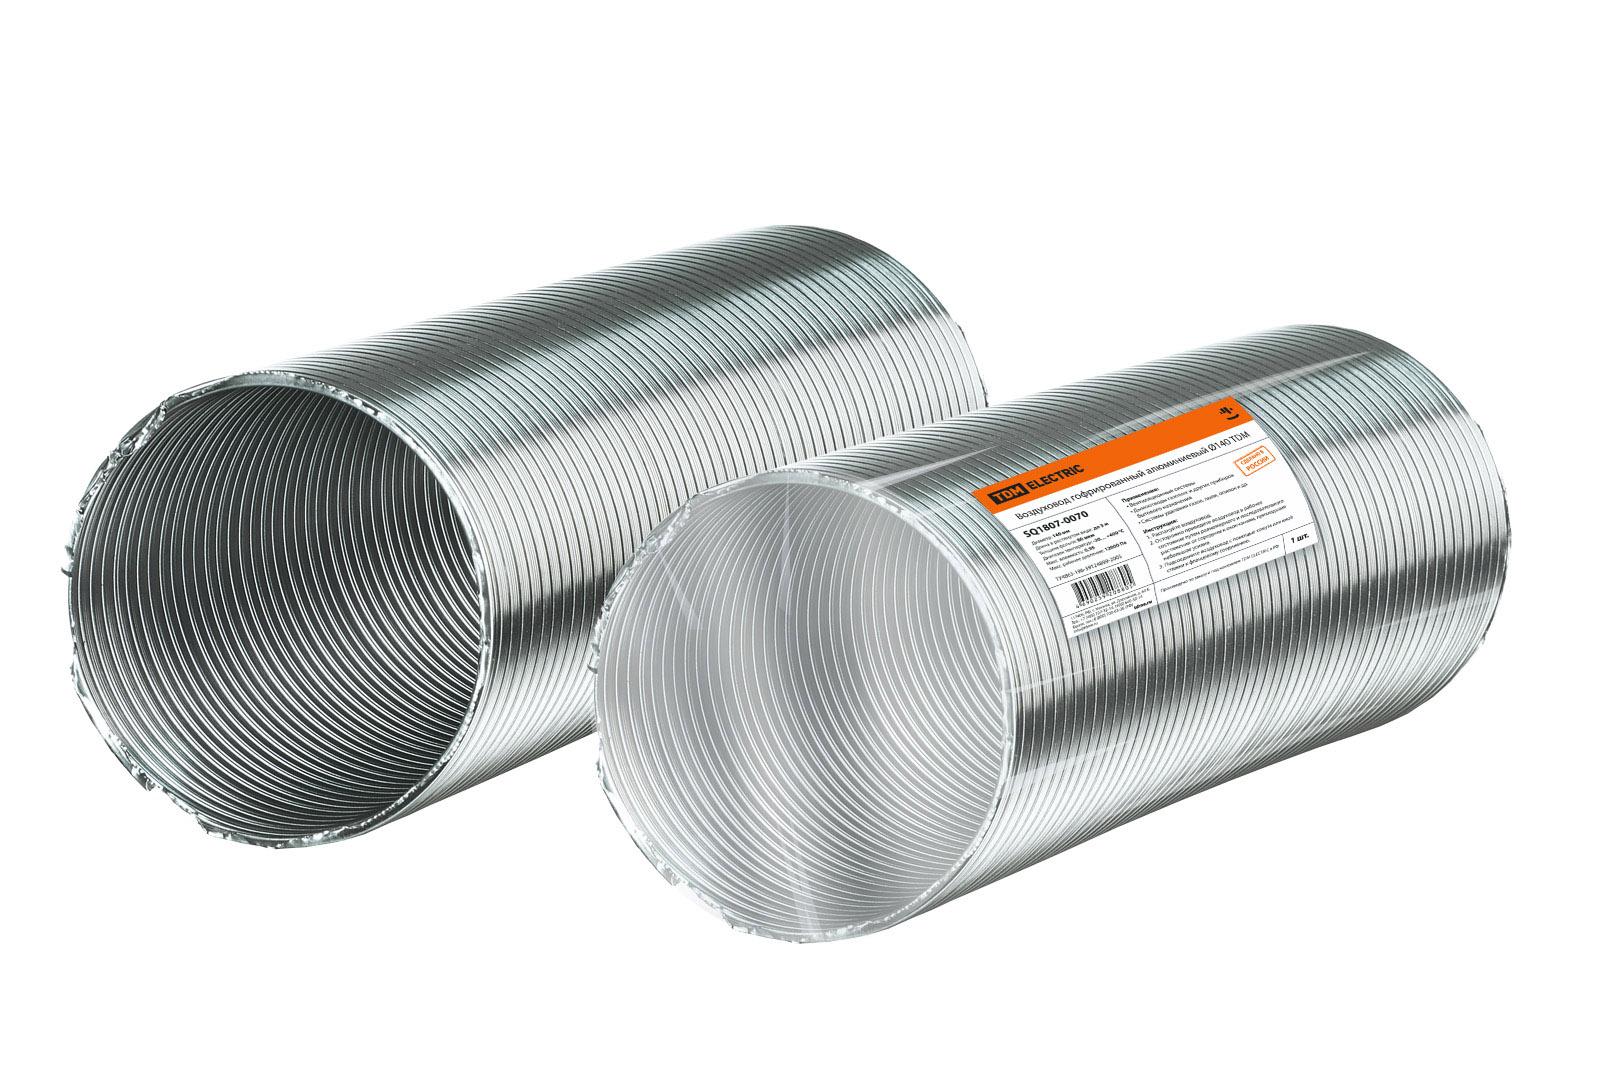 Воздуховод ТДМВоздуховоды (климат)<br>Тип: воздуховод, Тип воздуховода: гибкий, Материал: алюминий, Форма: круглая, Диаметр: 140, Мин. длина: 0.6, Макс. длина: 3<br>